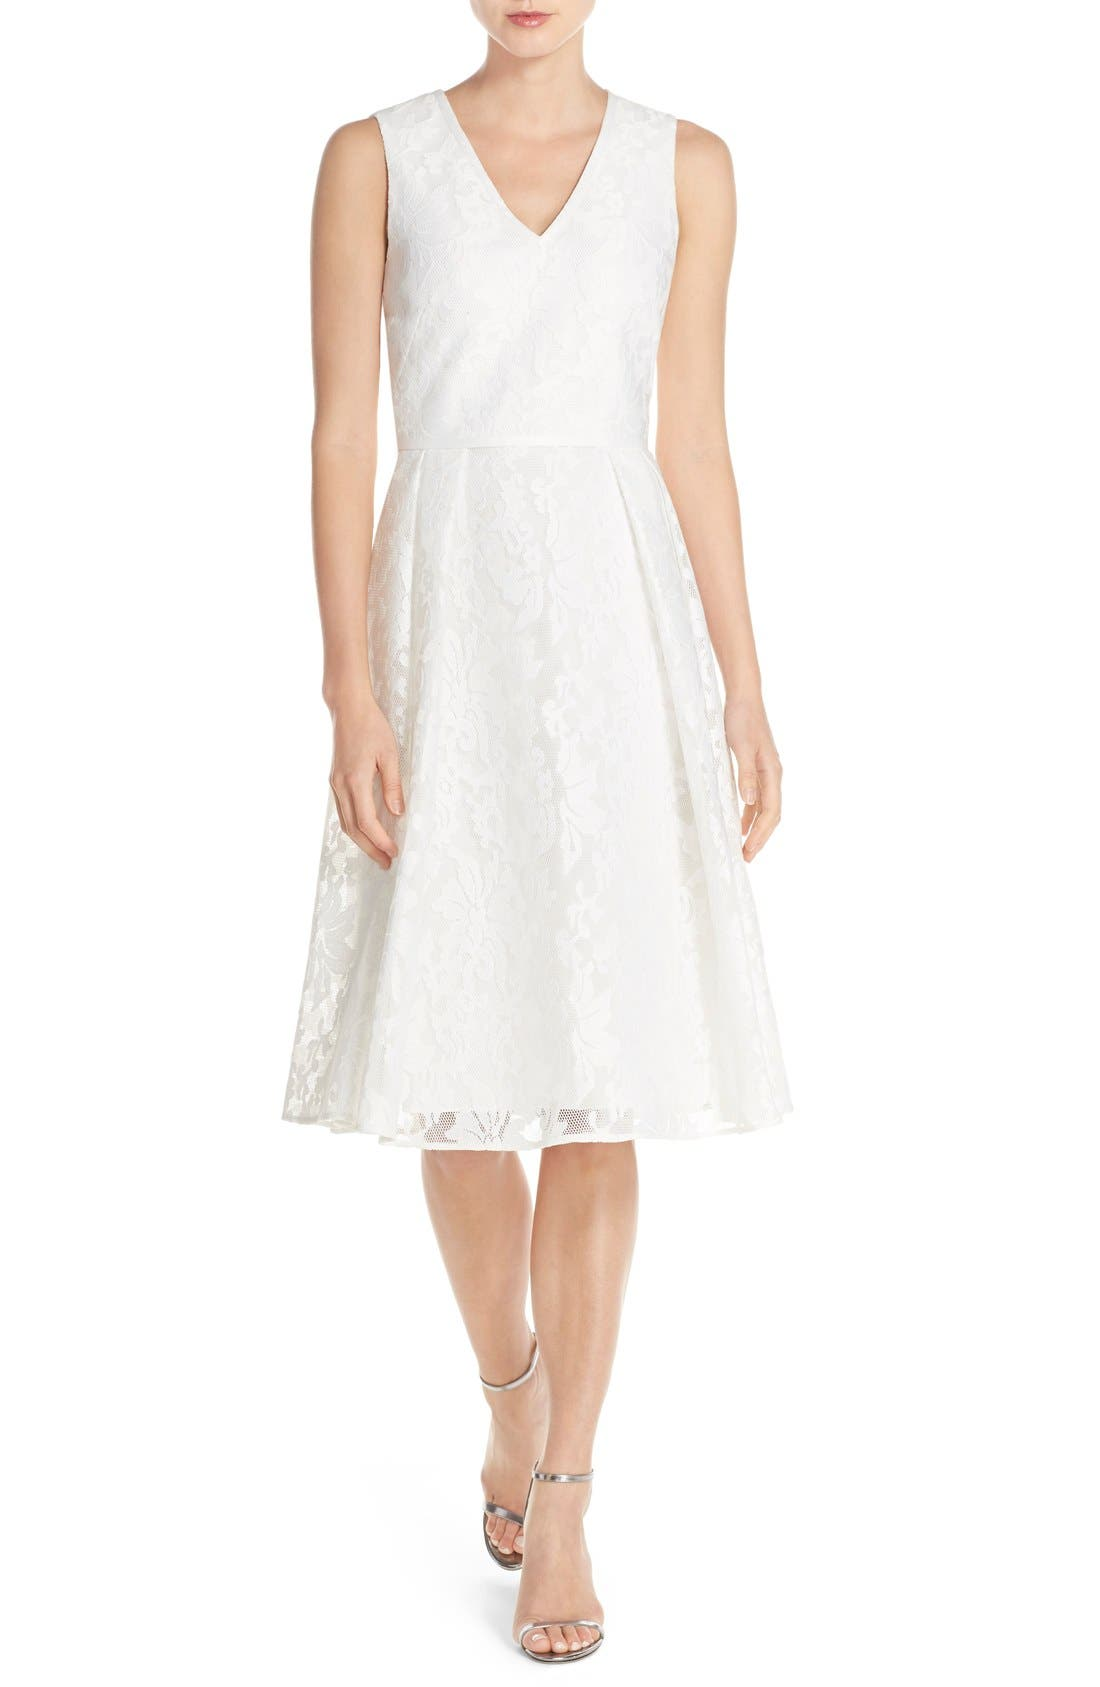 Alternate Image 1 Selected - Ted Baker London 'Deah' V-Neck Bonded Mesh Lace Dress